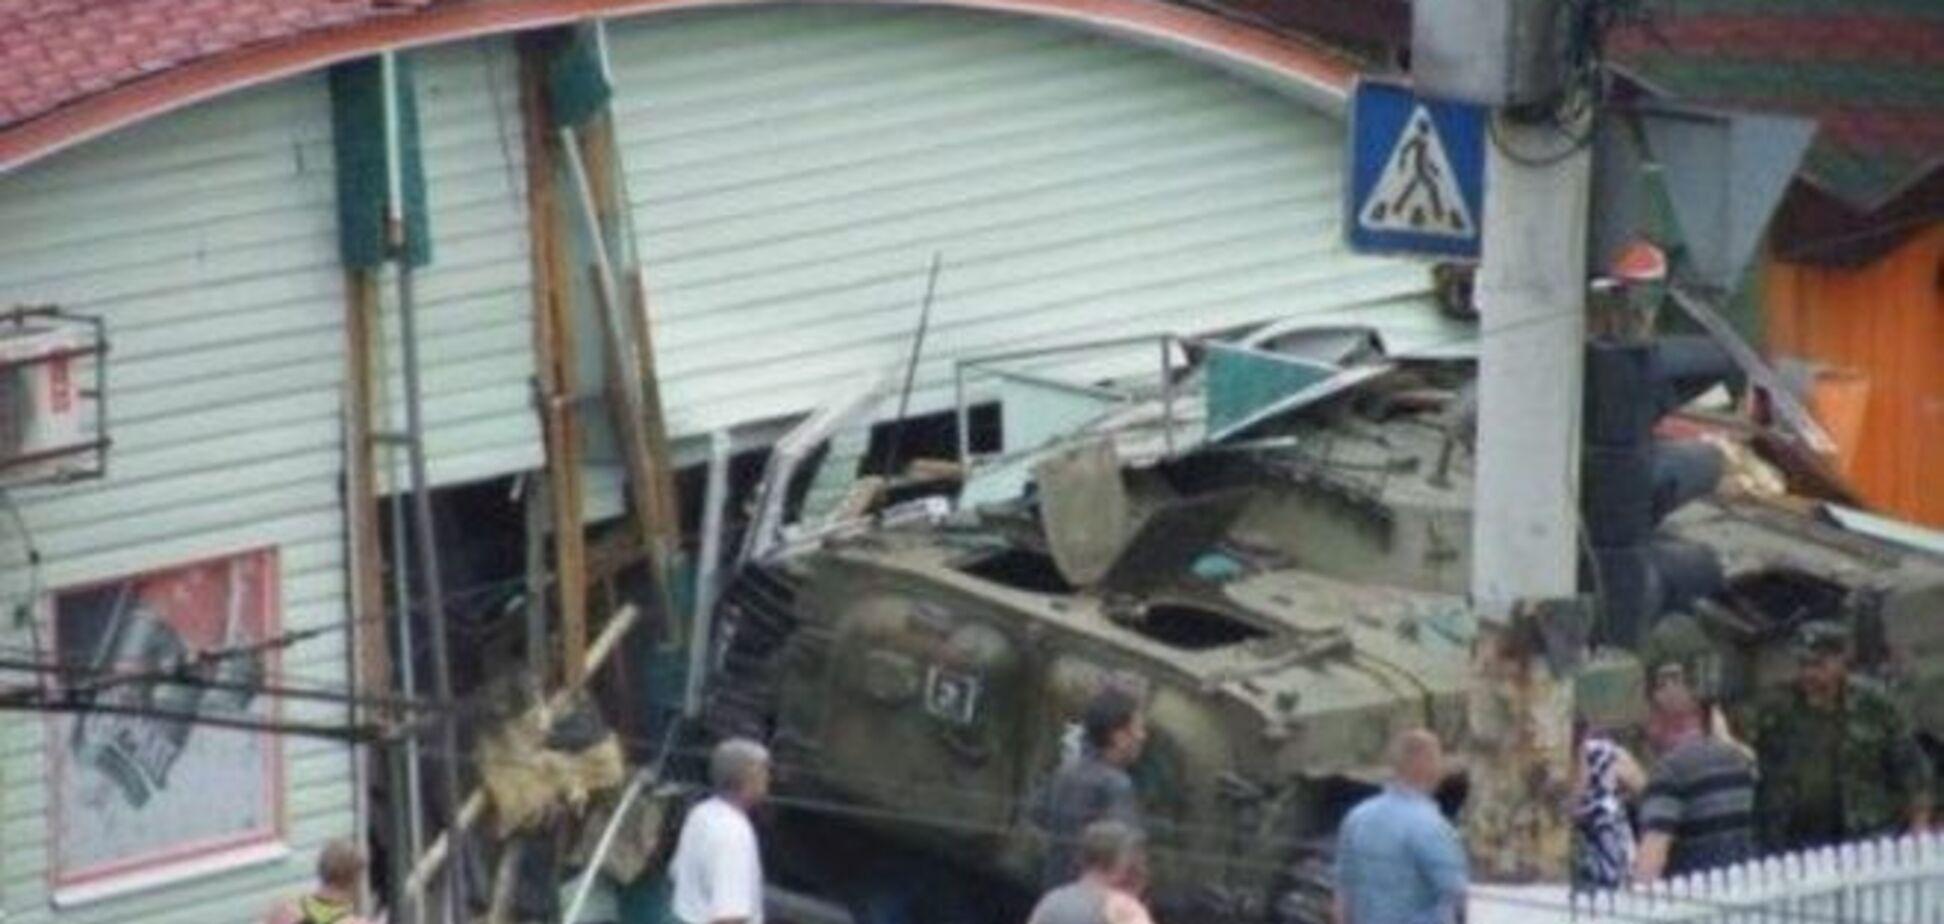 Ждем бунта? БМП террористов в Луганске задавил трех женщин